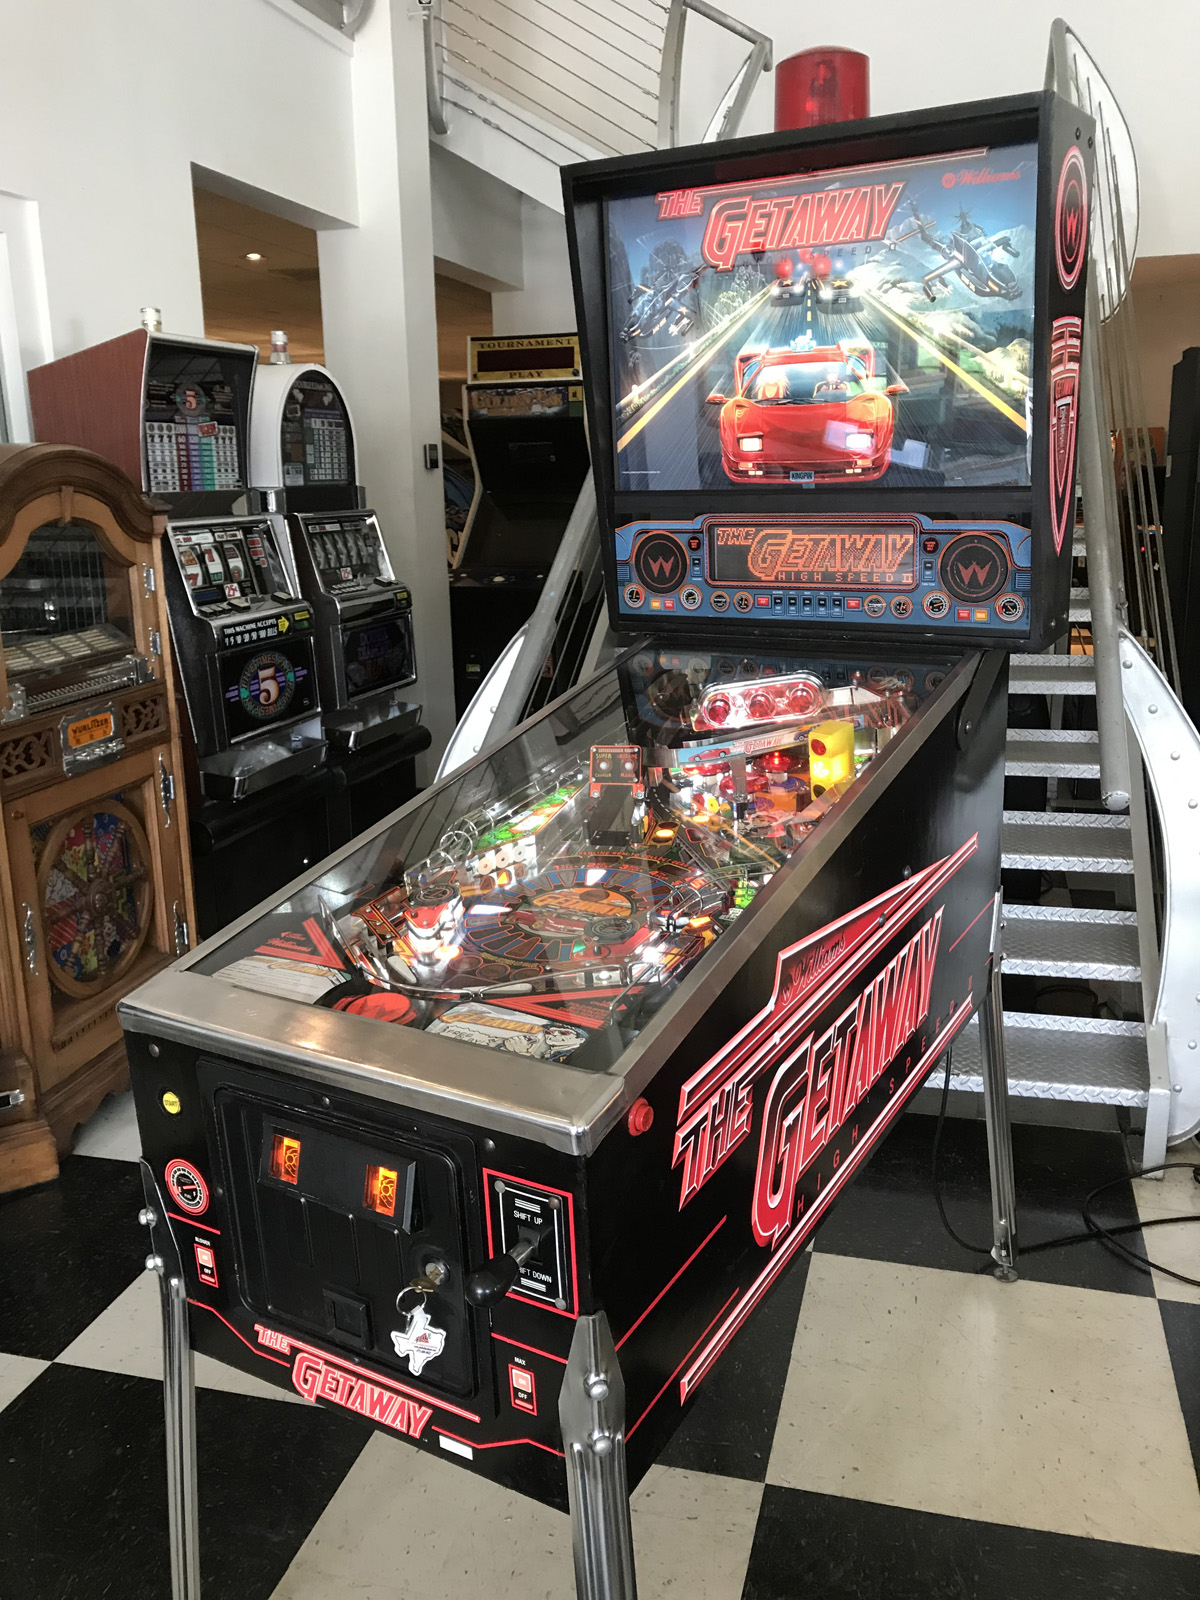 The Getaway: High Speed 2 – Pinball Machine * | Fun!